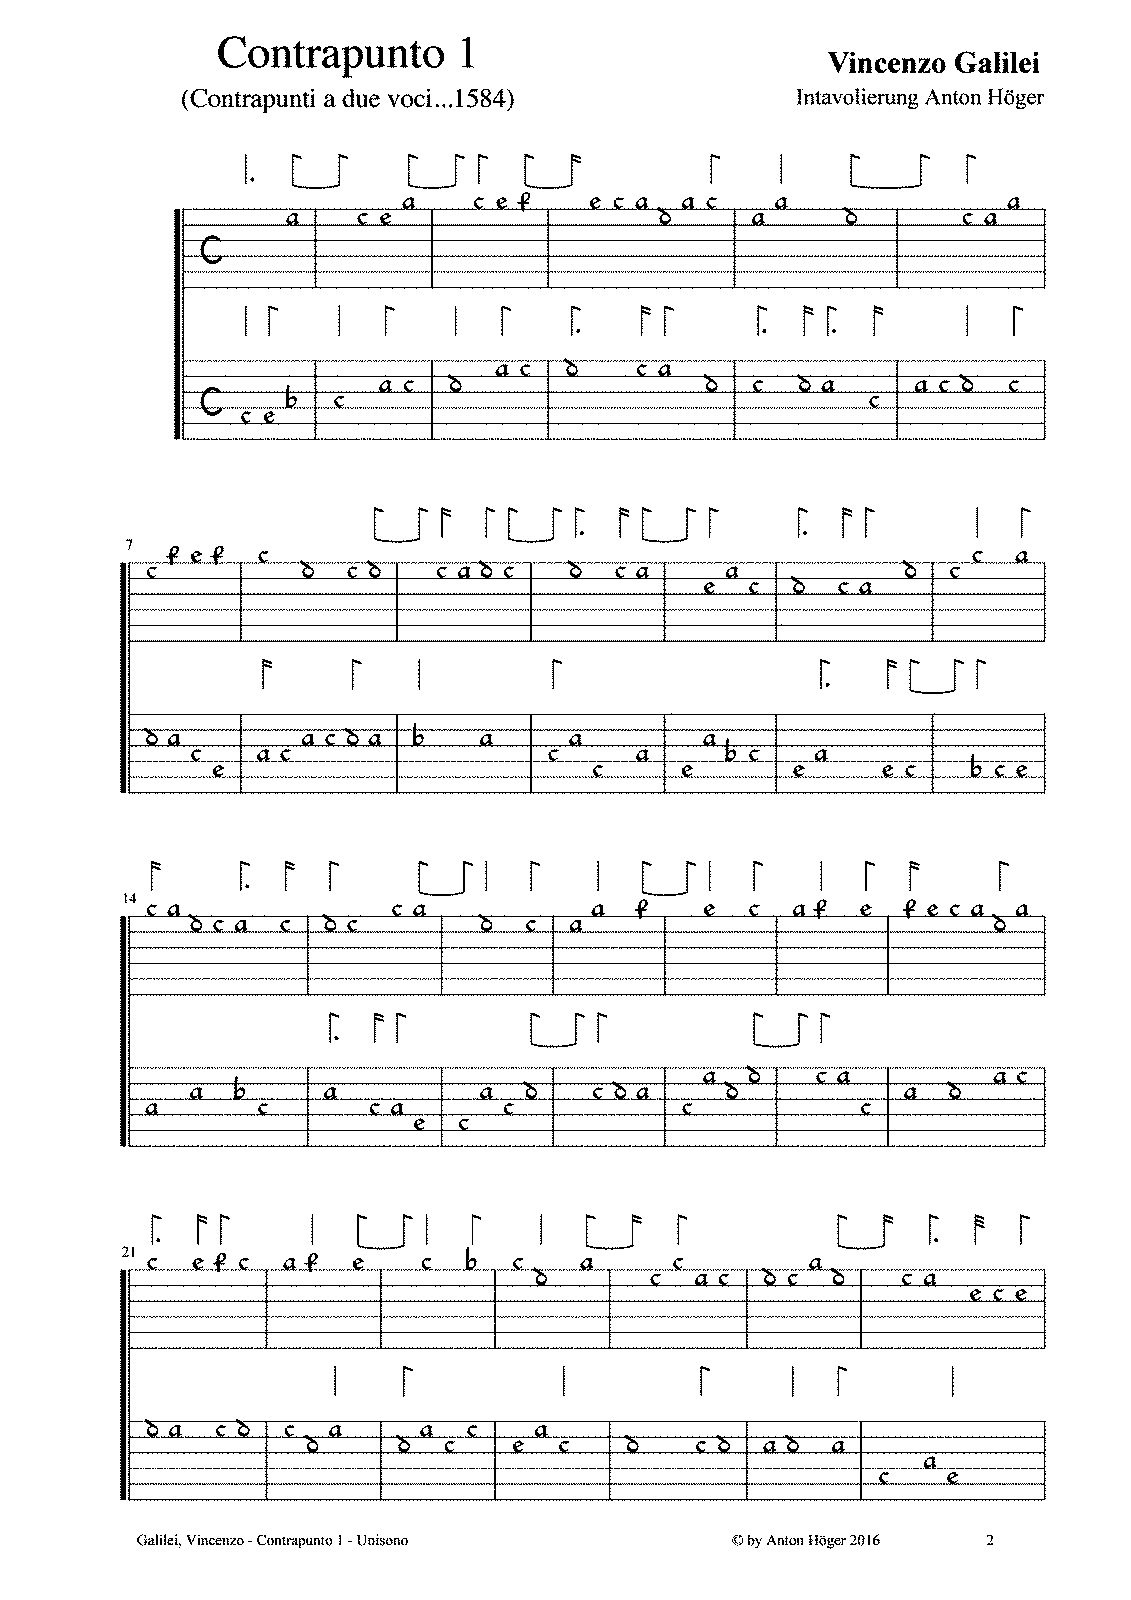 V. Galilei, Contrapunto primo